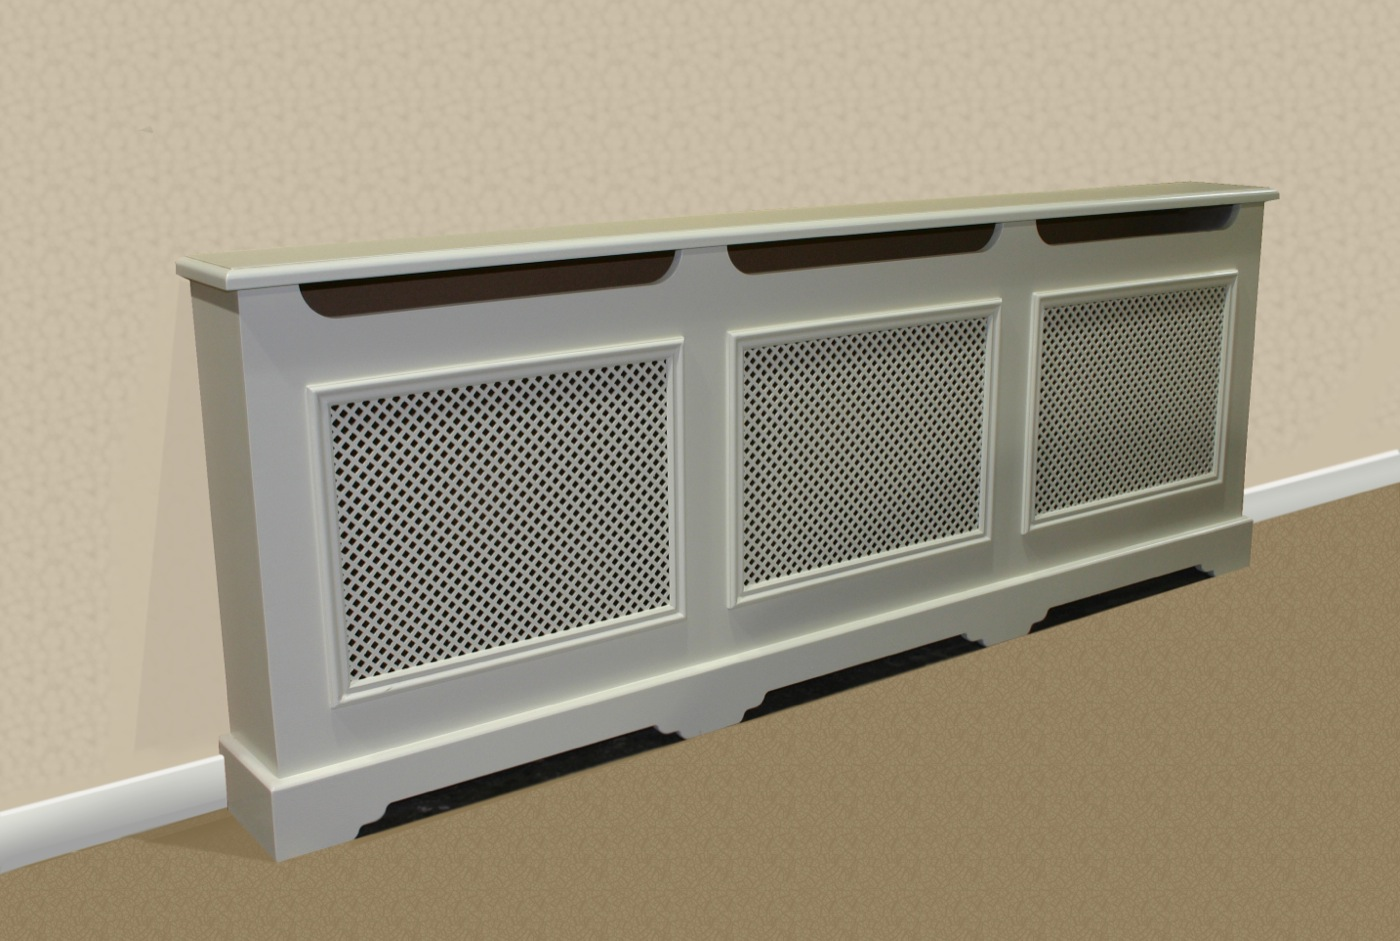 Radiator Cover Plans Diybanter Diy Home Improvement Forum